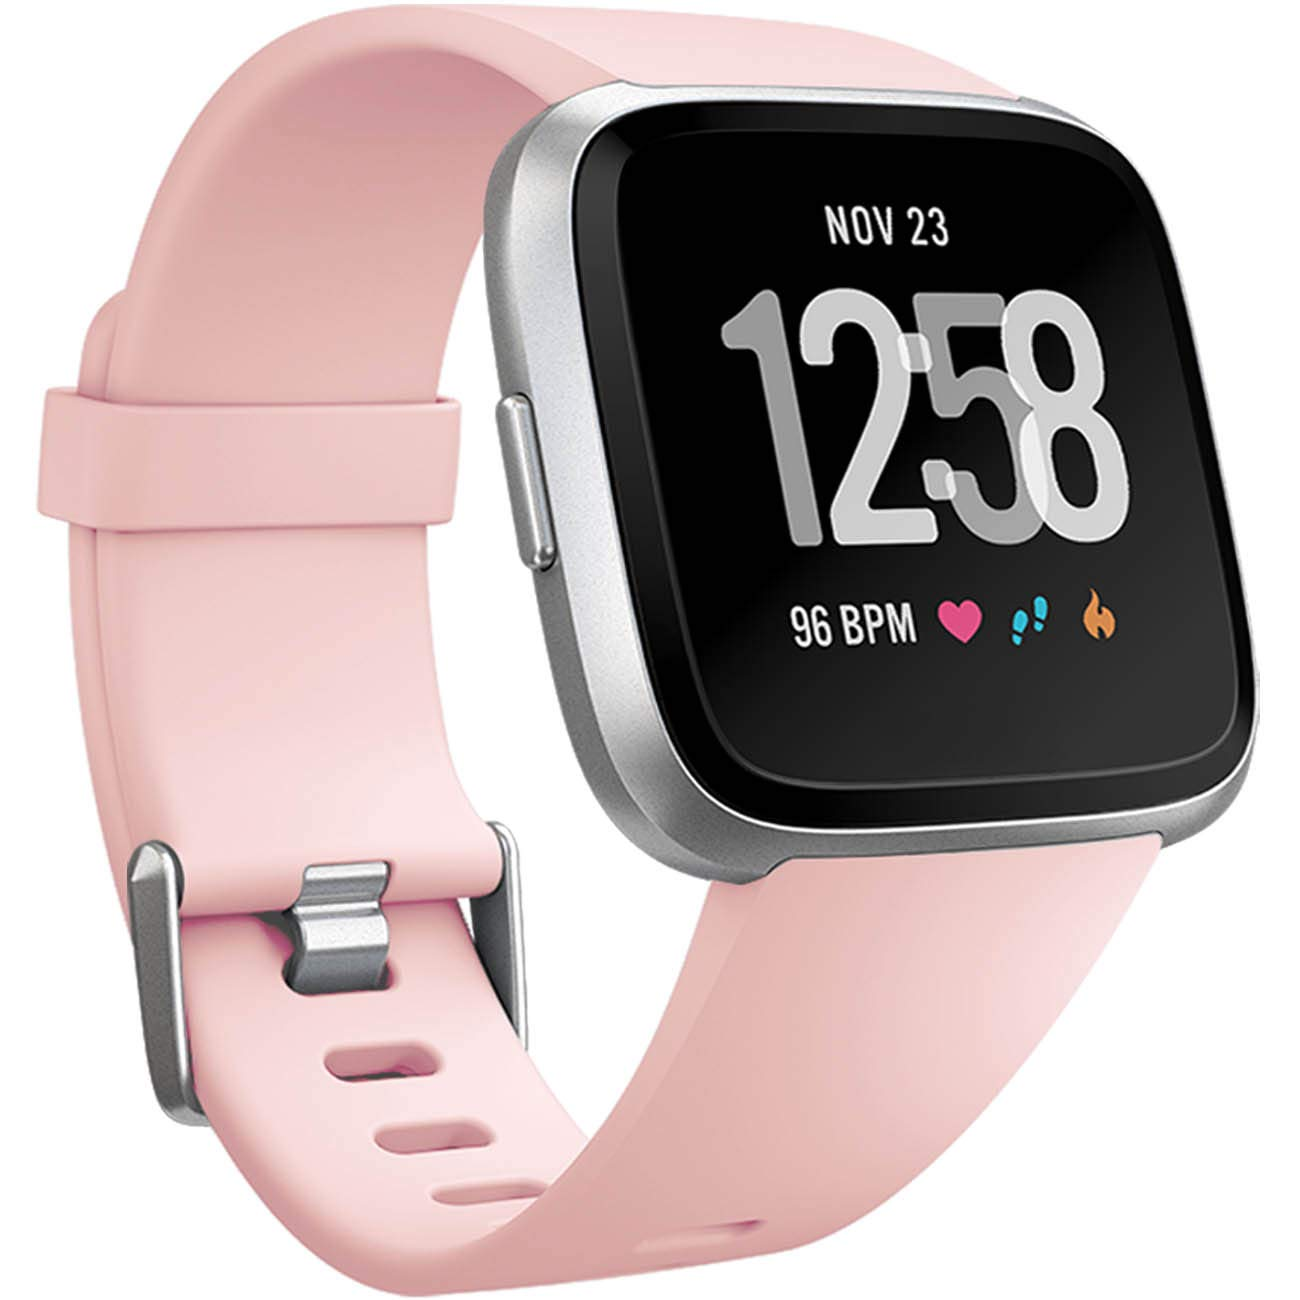 Malla Large para Fitbit Versa / Versa 2 Arena rosa -7M5NNGBV